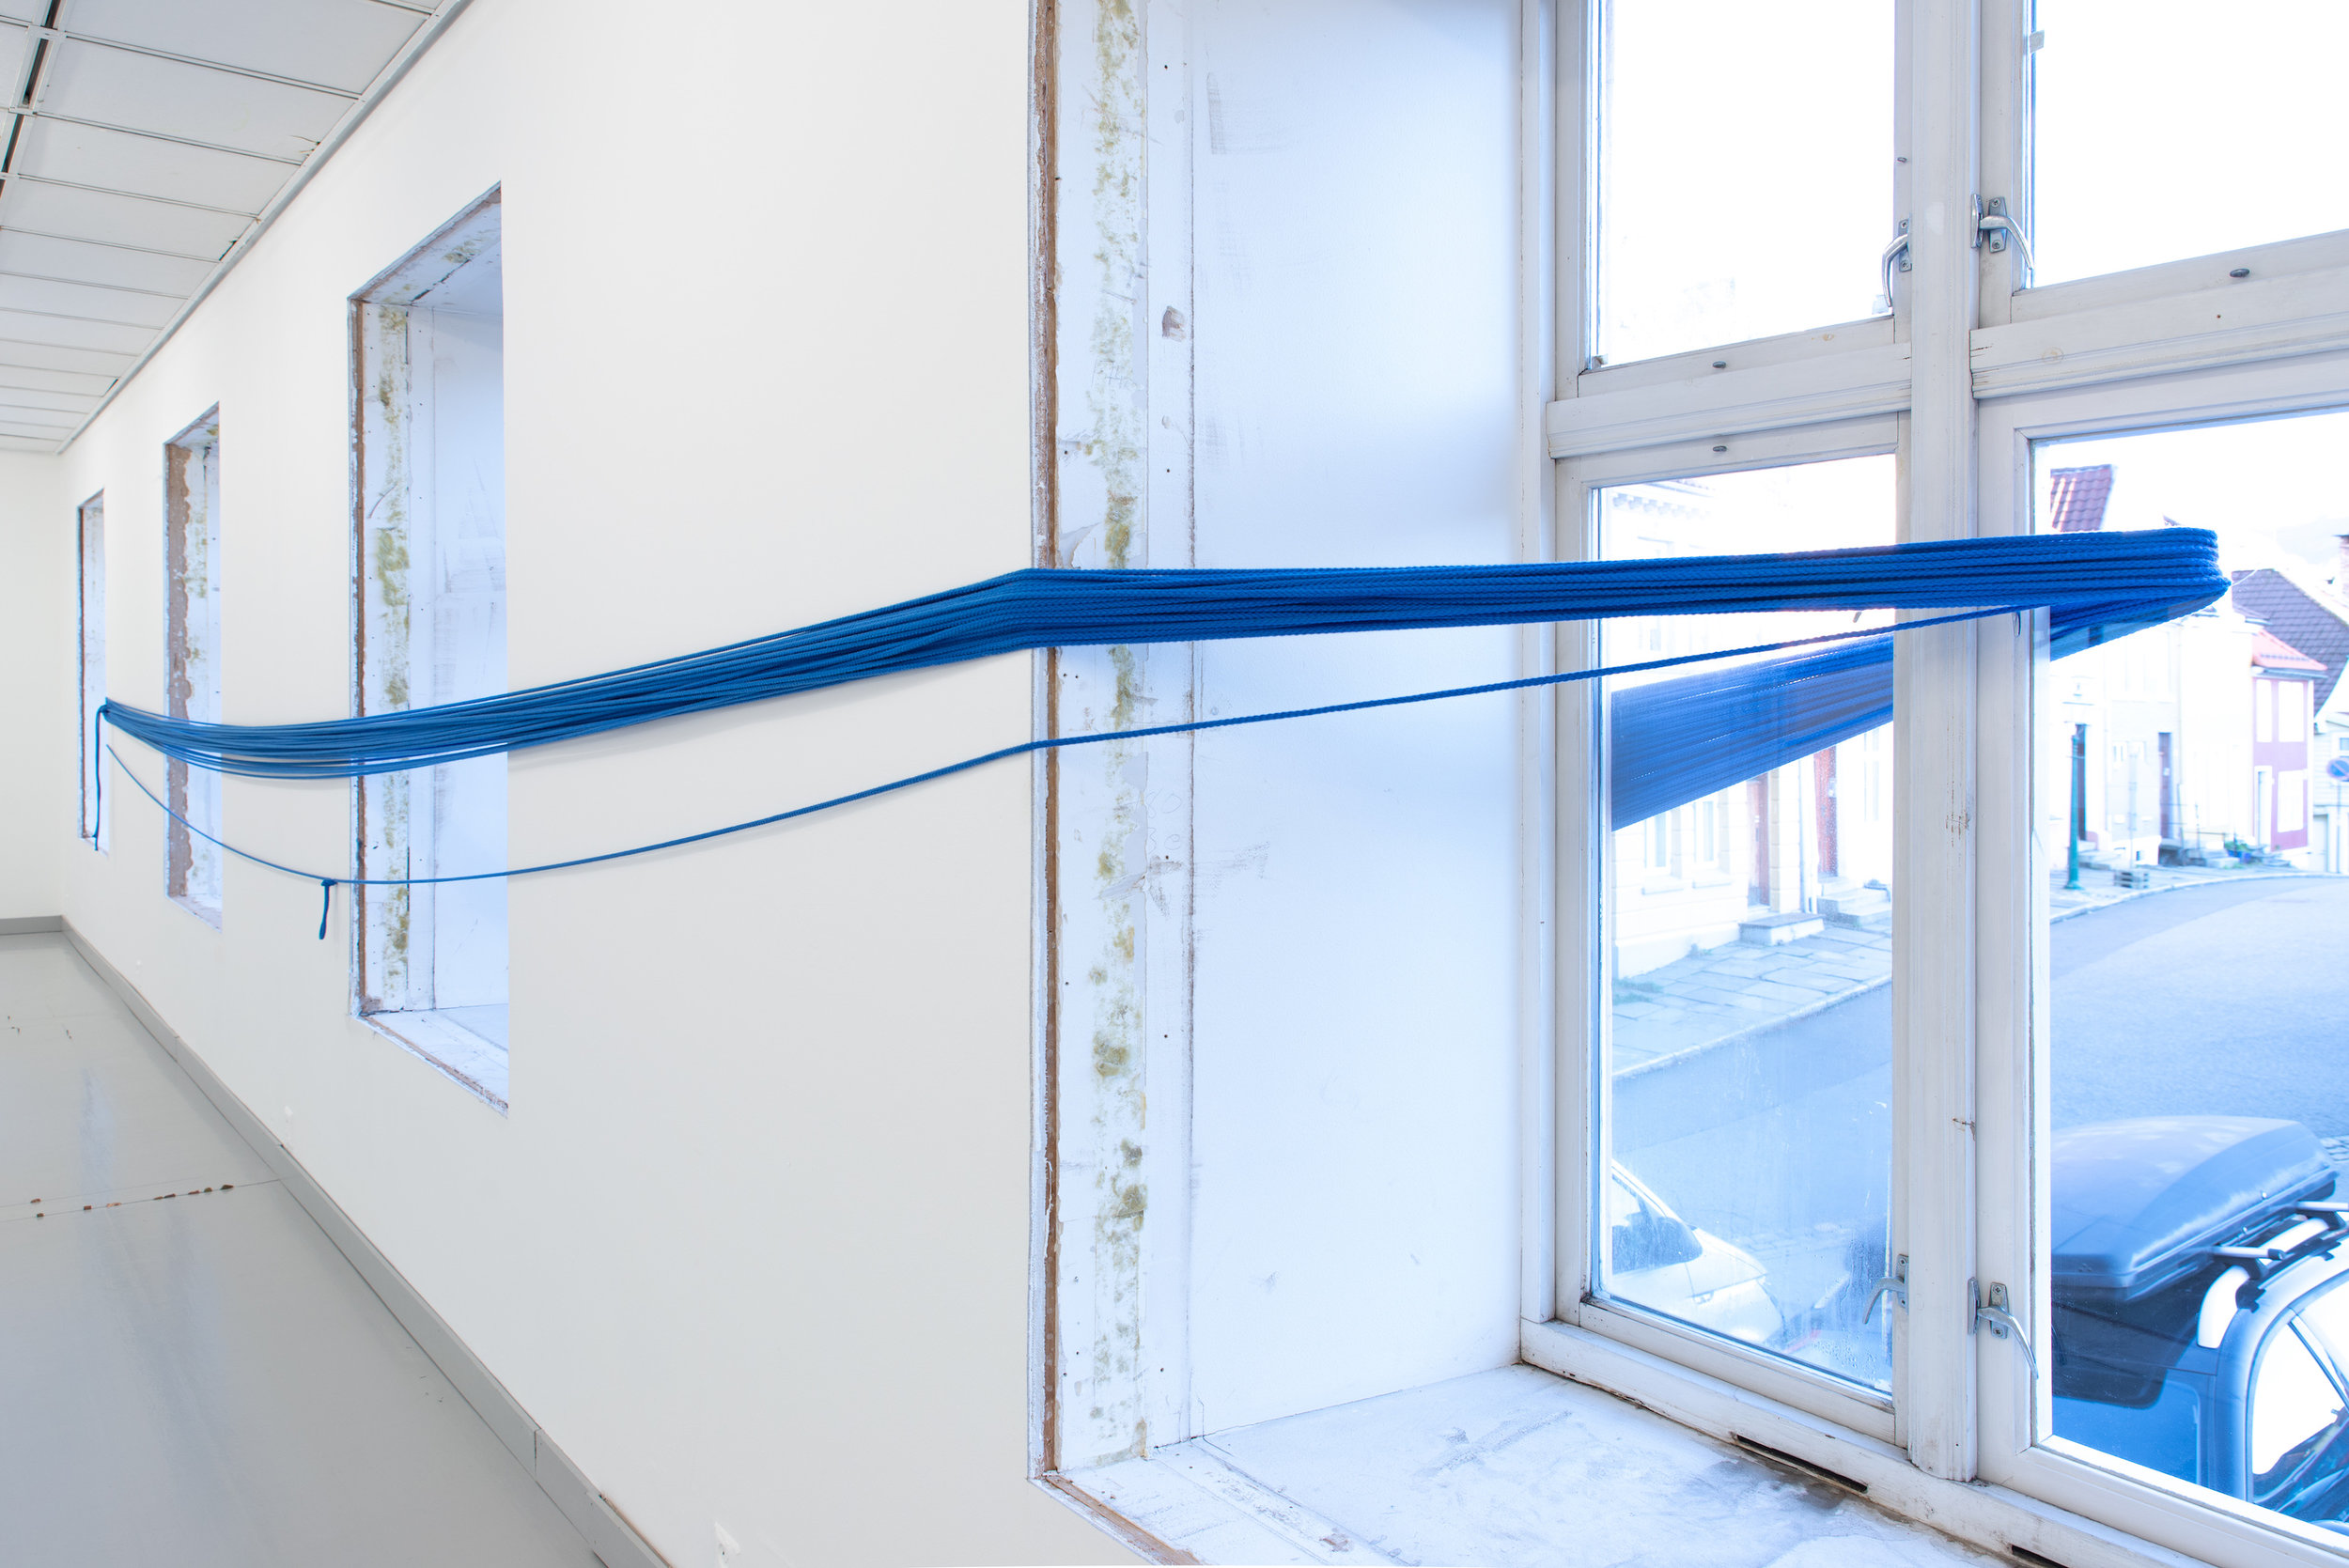 kate-newby-at-hordaland-kunstsenter17.jpg